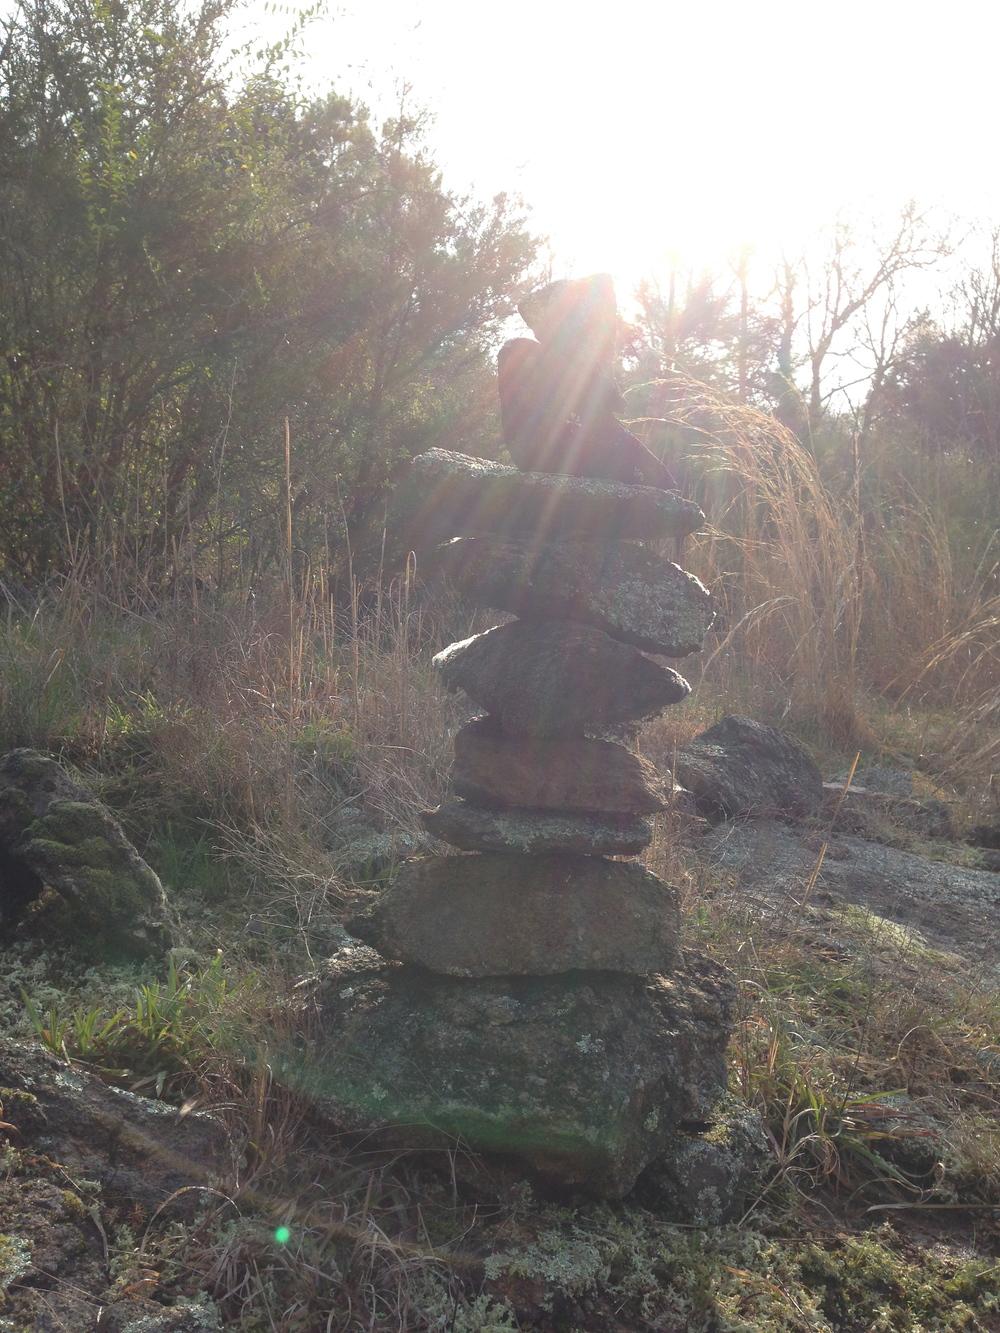 Stacked stone. Athens, GA. Spring 2014